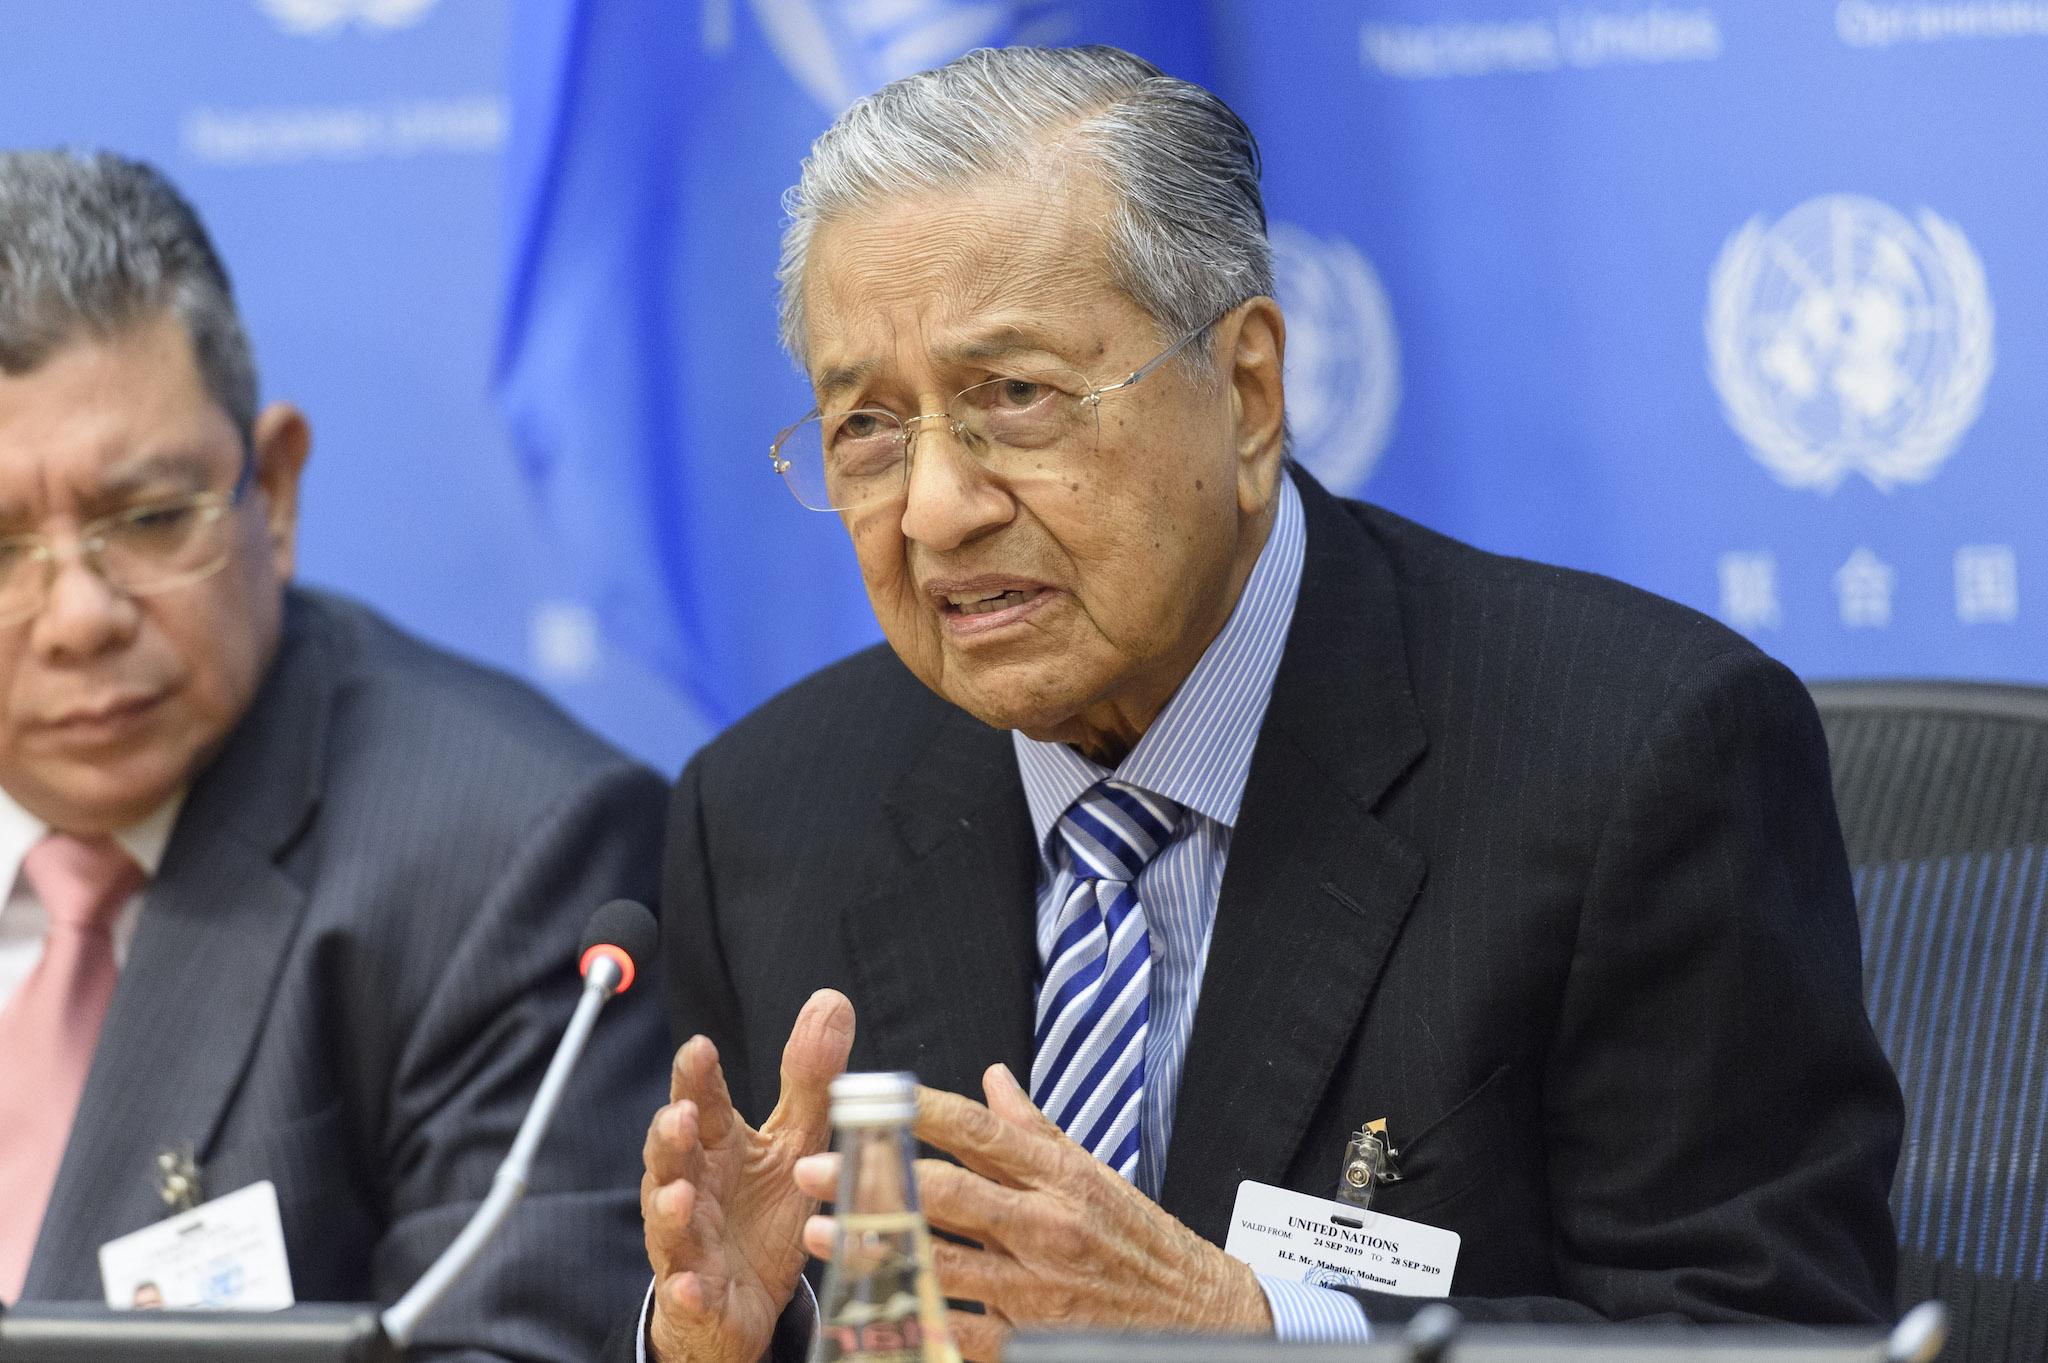 mahathir bin mohamad, premierminister von malaysia. foto un